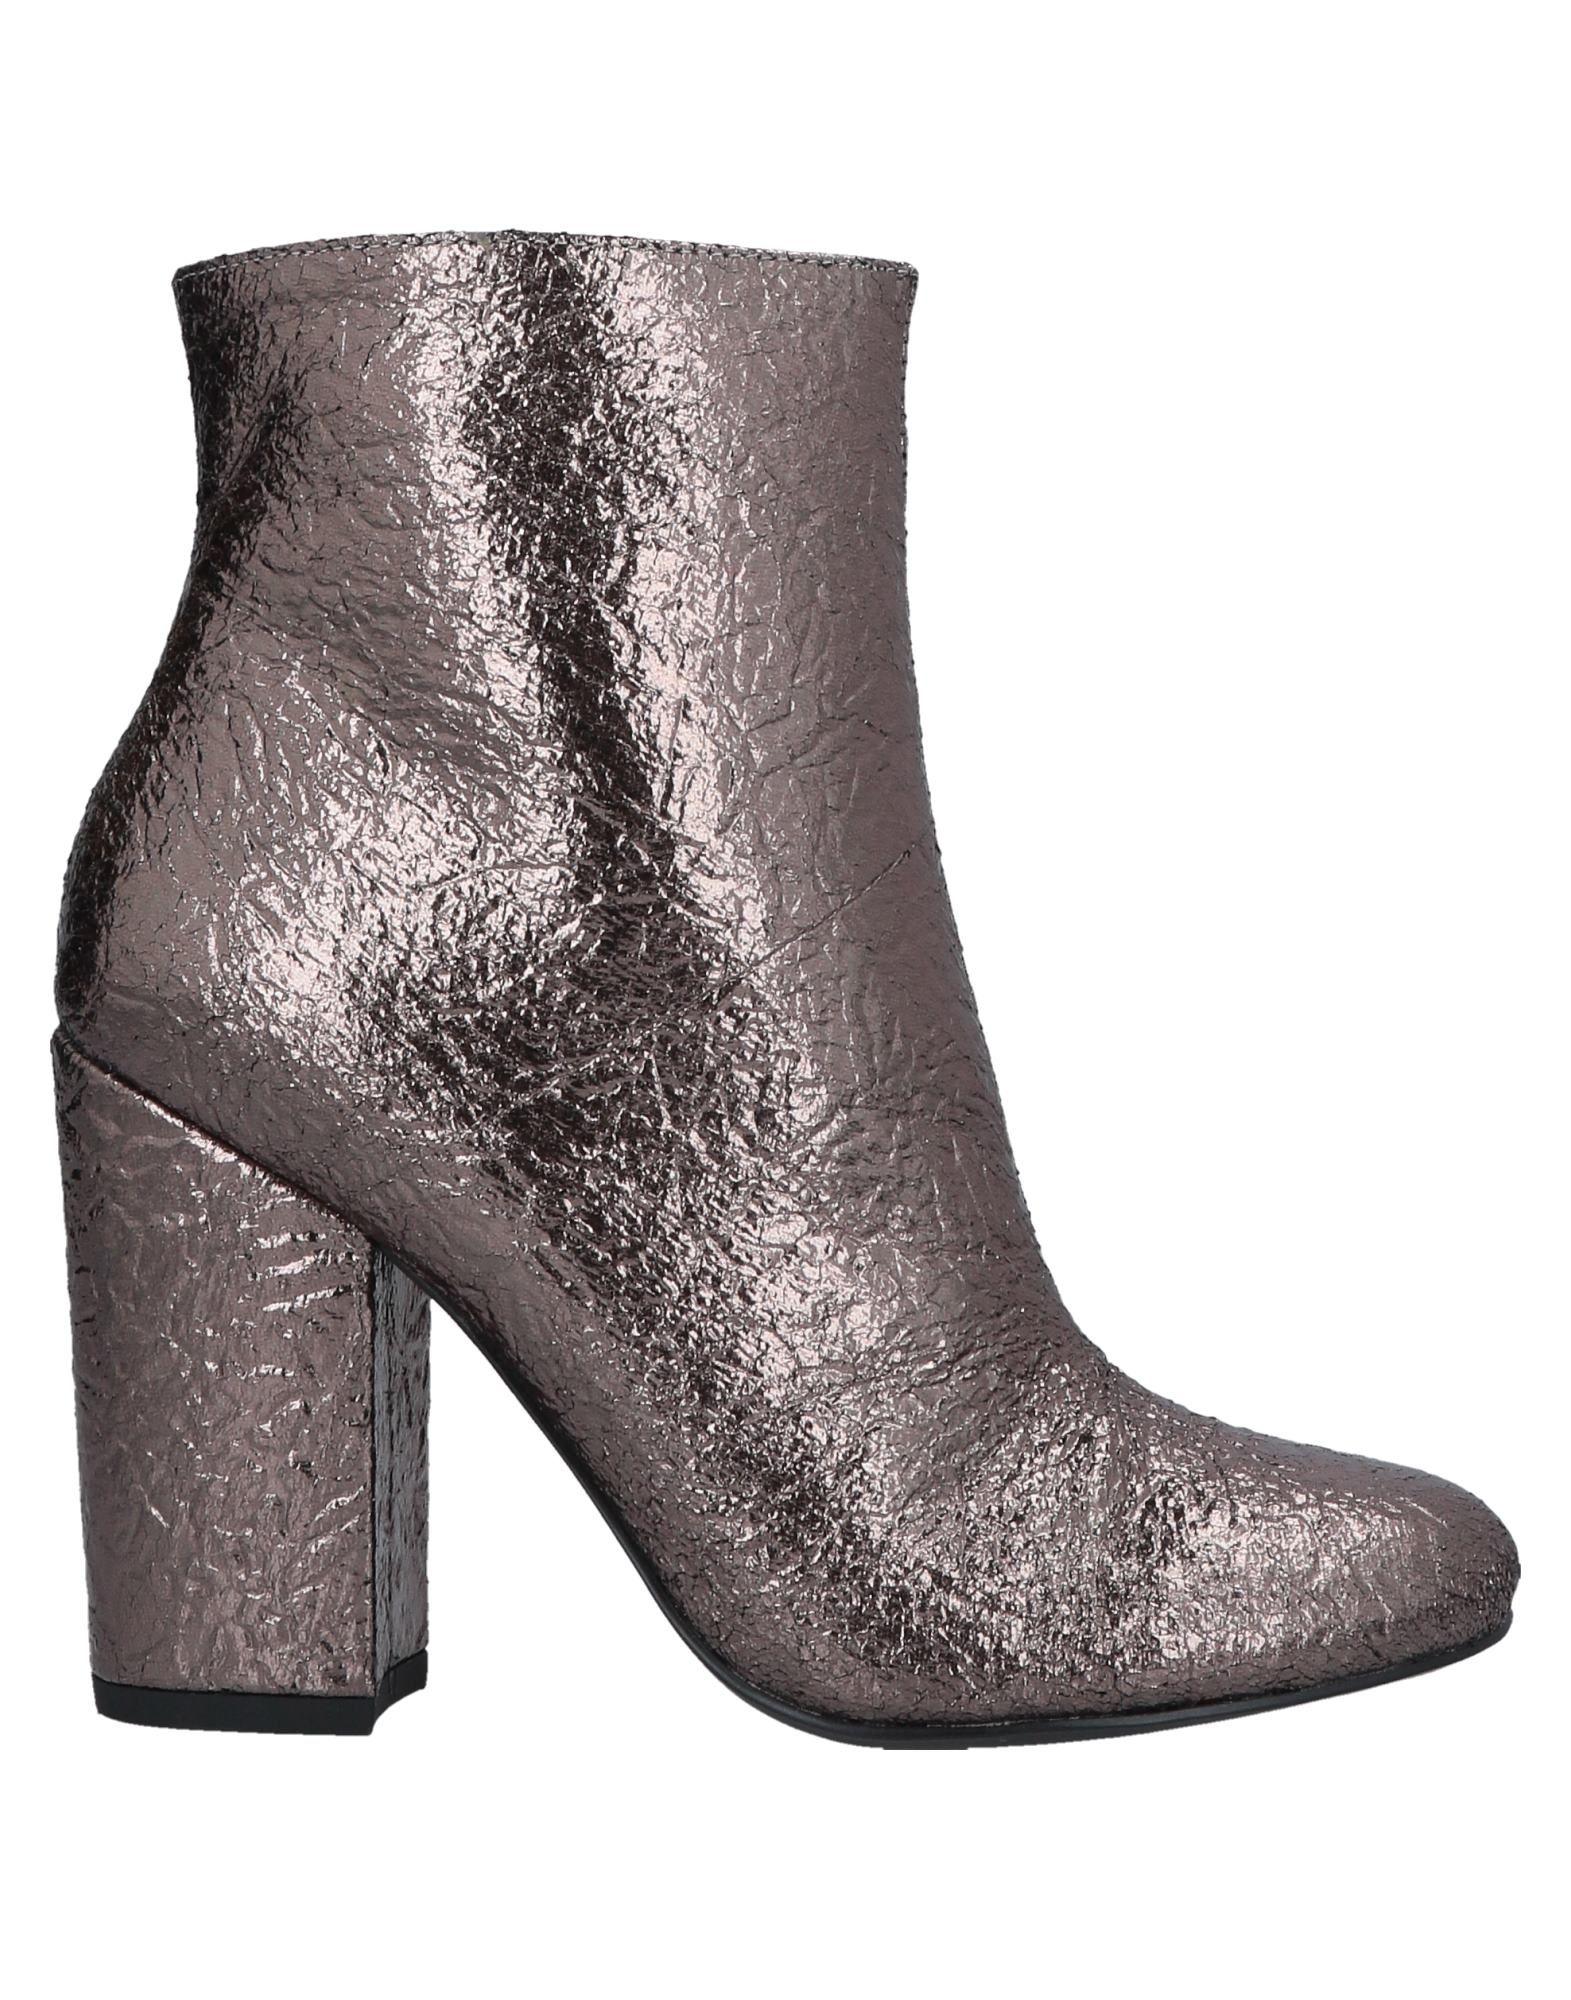 COLORS OF CALIFORNIA Полусапоги и высокие ботинки karma of charme полусапоги и высокие ботинки